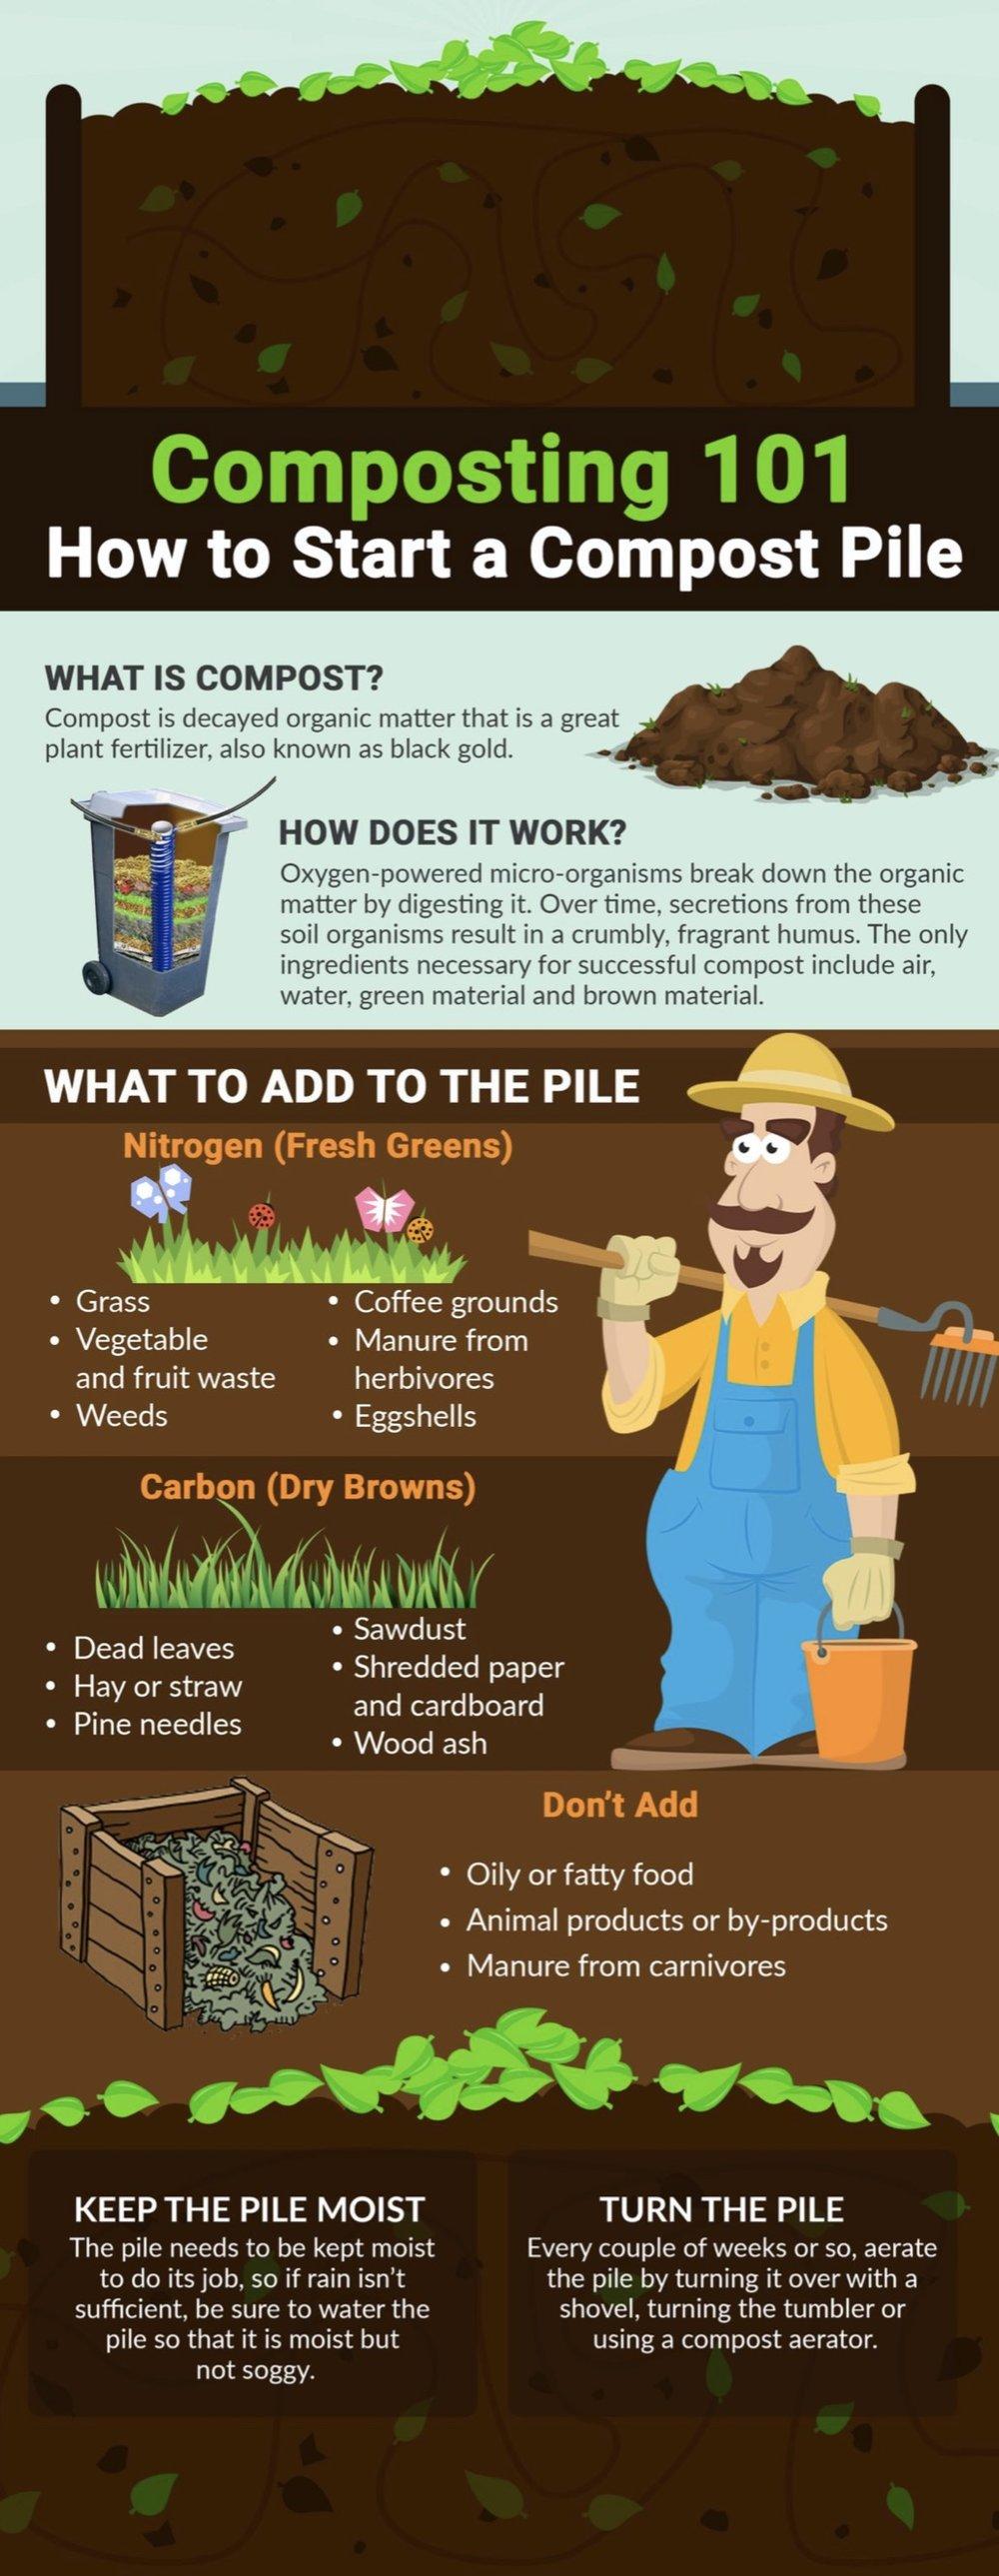 Source http://purelivingforlife.com/composting-101/